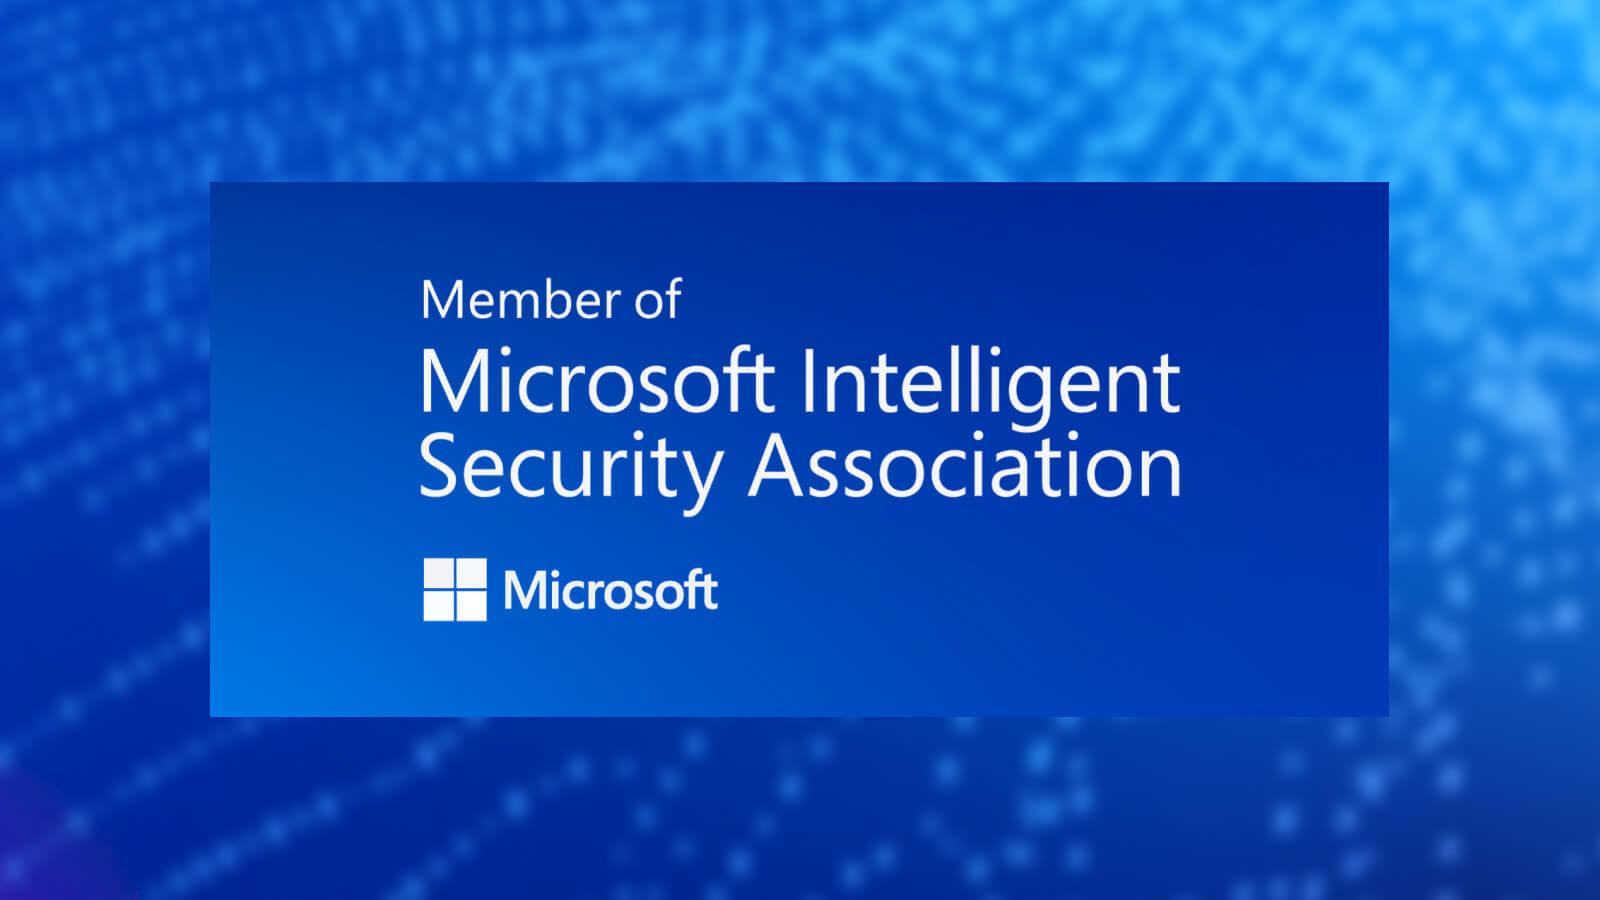 HYPR joins Microsoft Intelligent Security Association